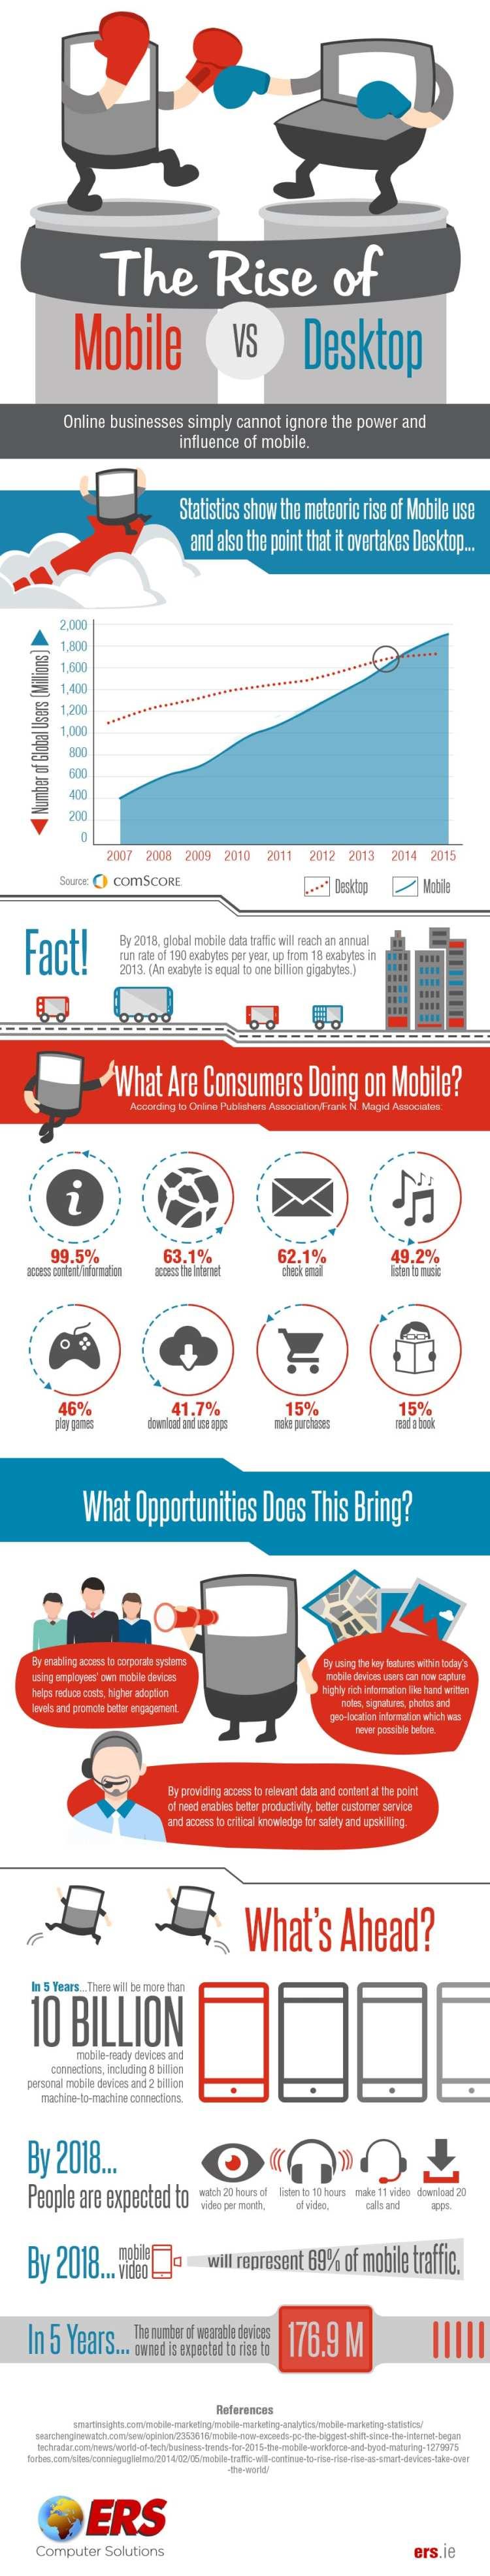 The Rise of Mobile vs Desktop